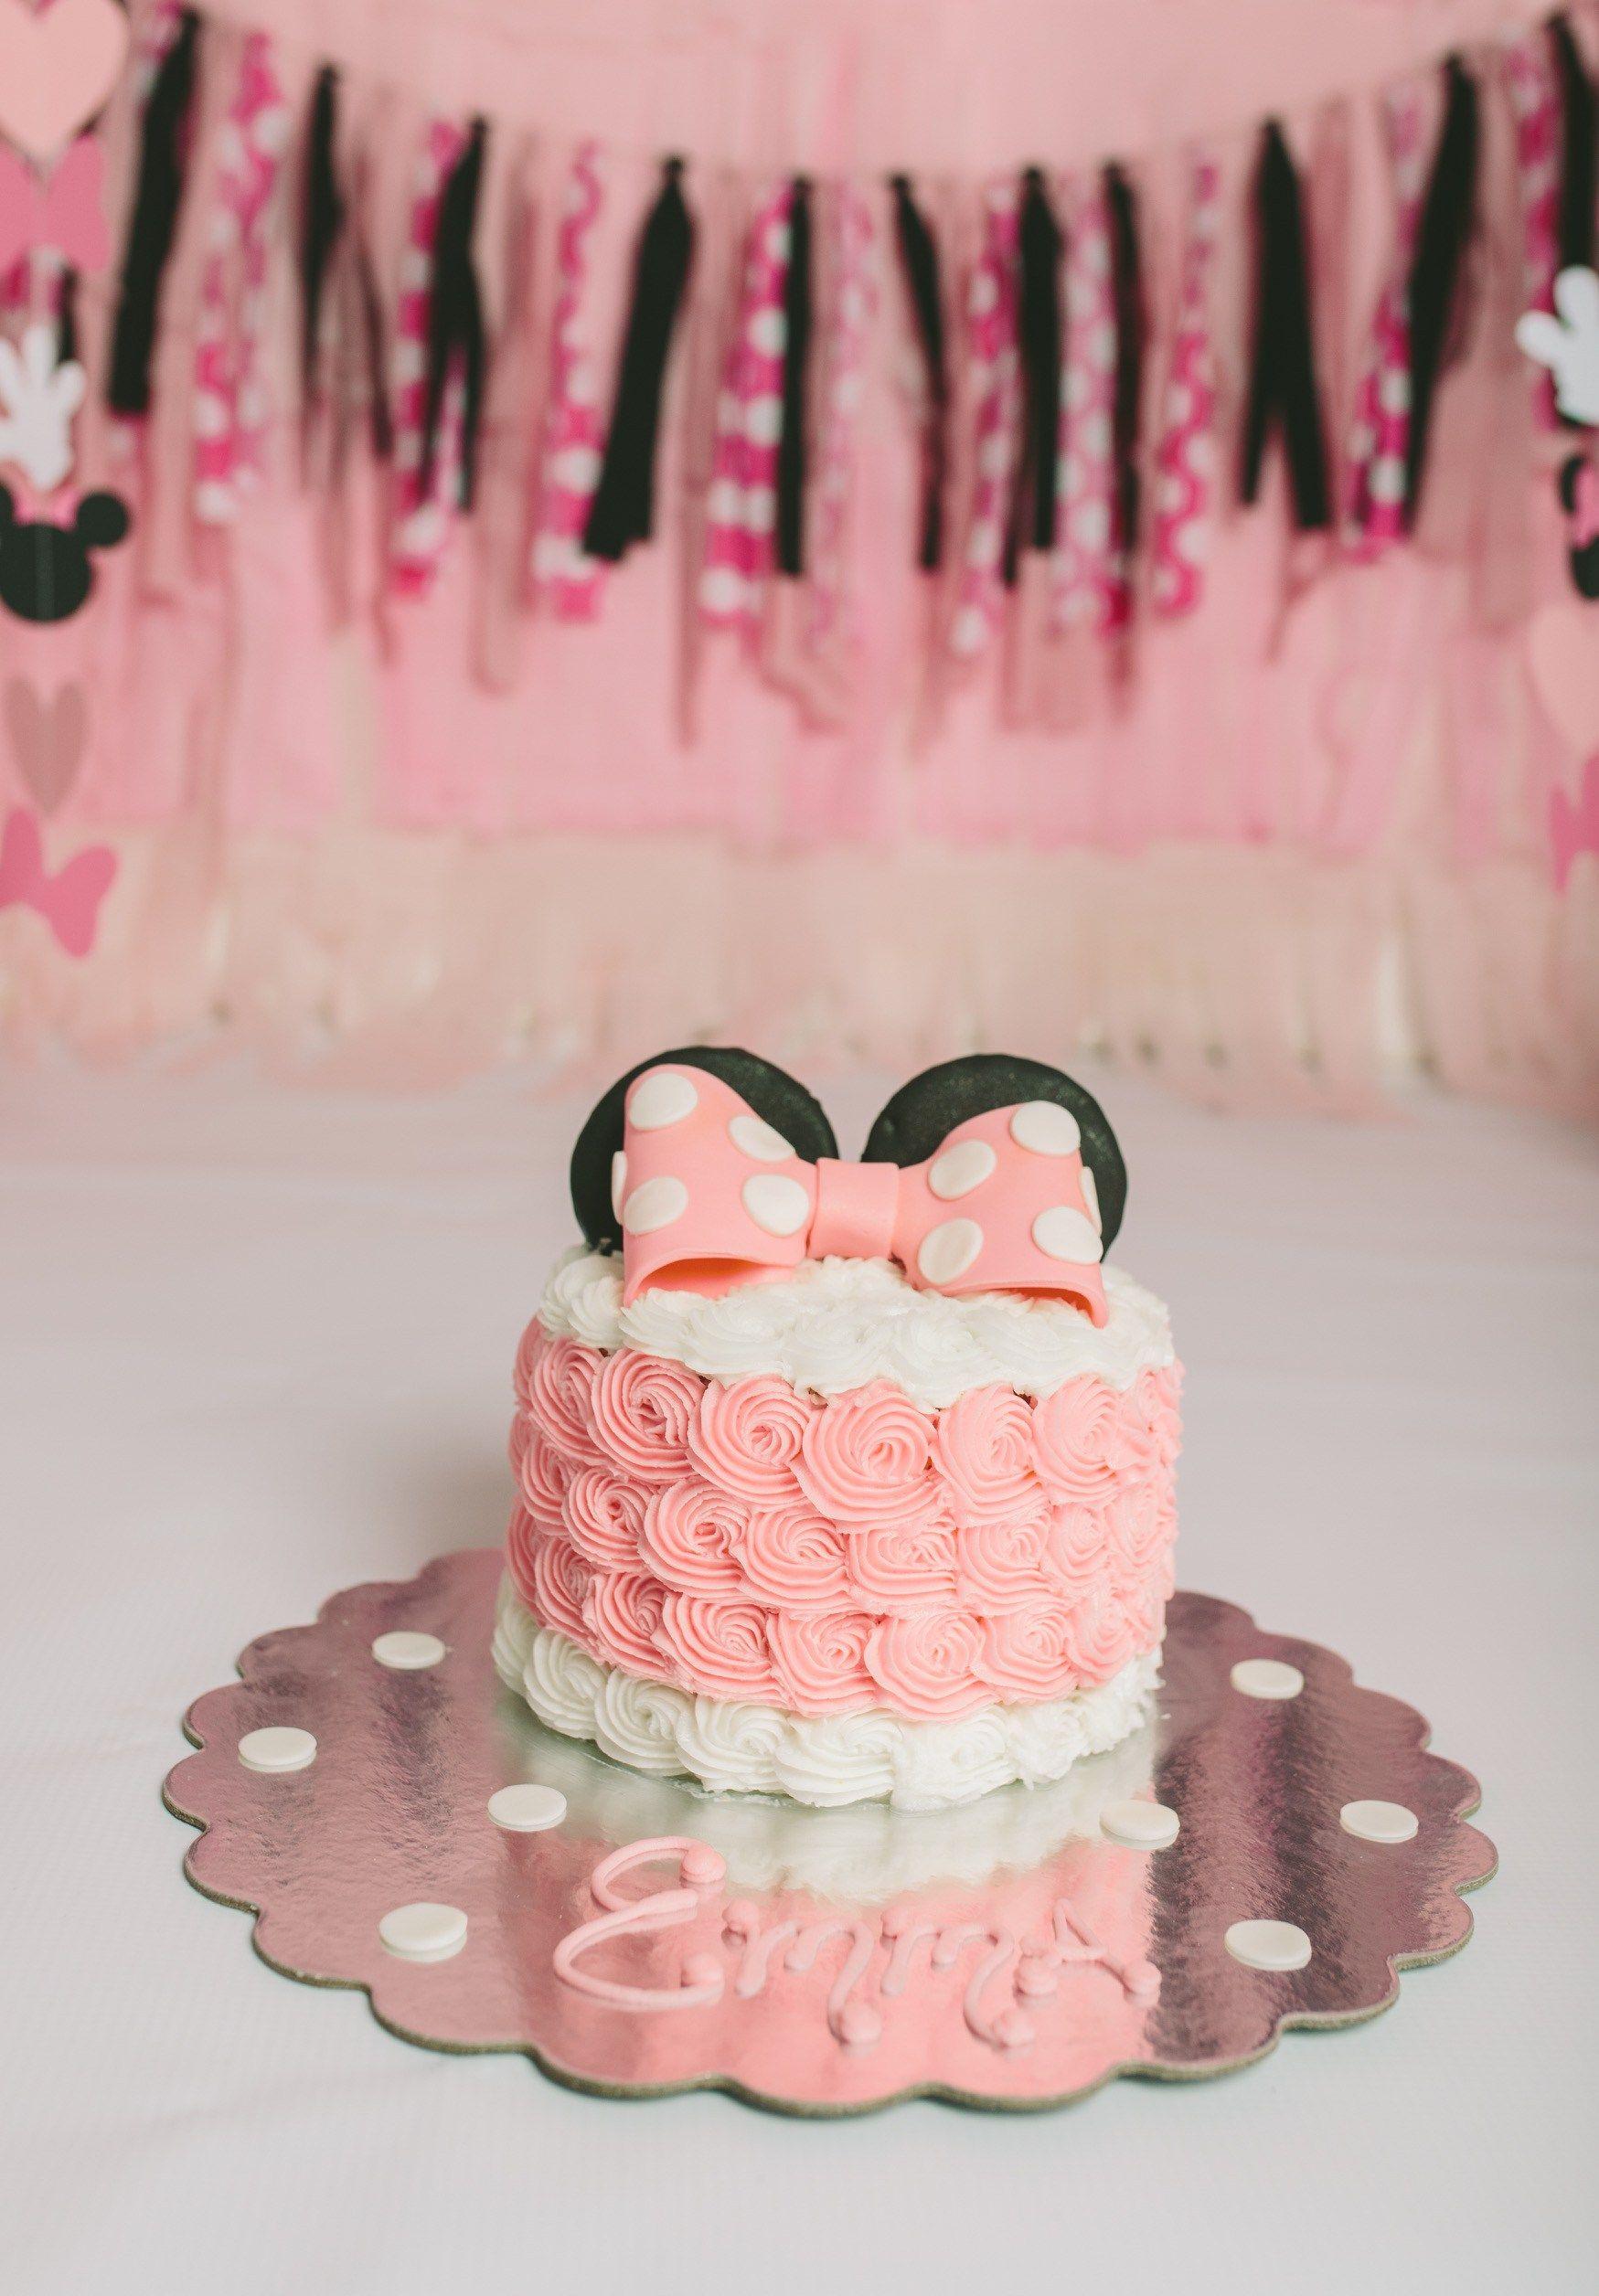 Torta Minnie Para Sesion De Fotos Minnie Mouse Birthday Cakes Minnie Mouse 1st Birthday Minnie Mouse First Birthday